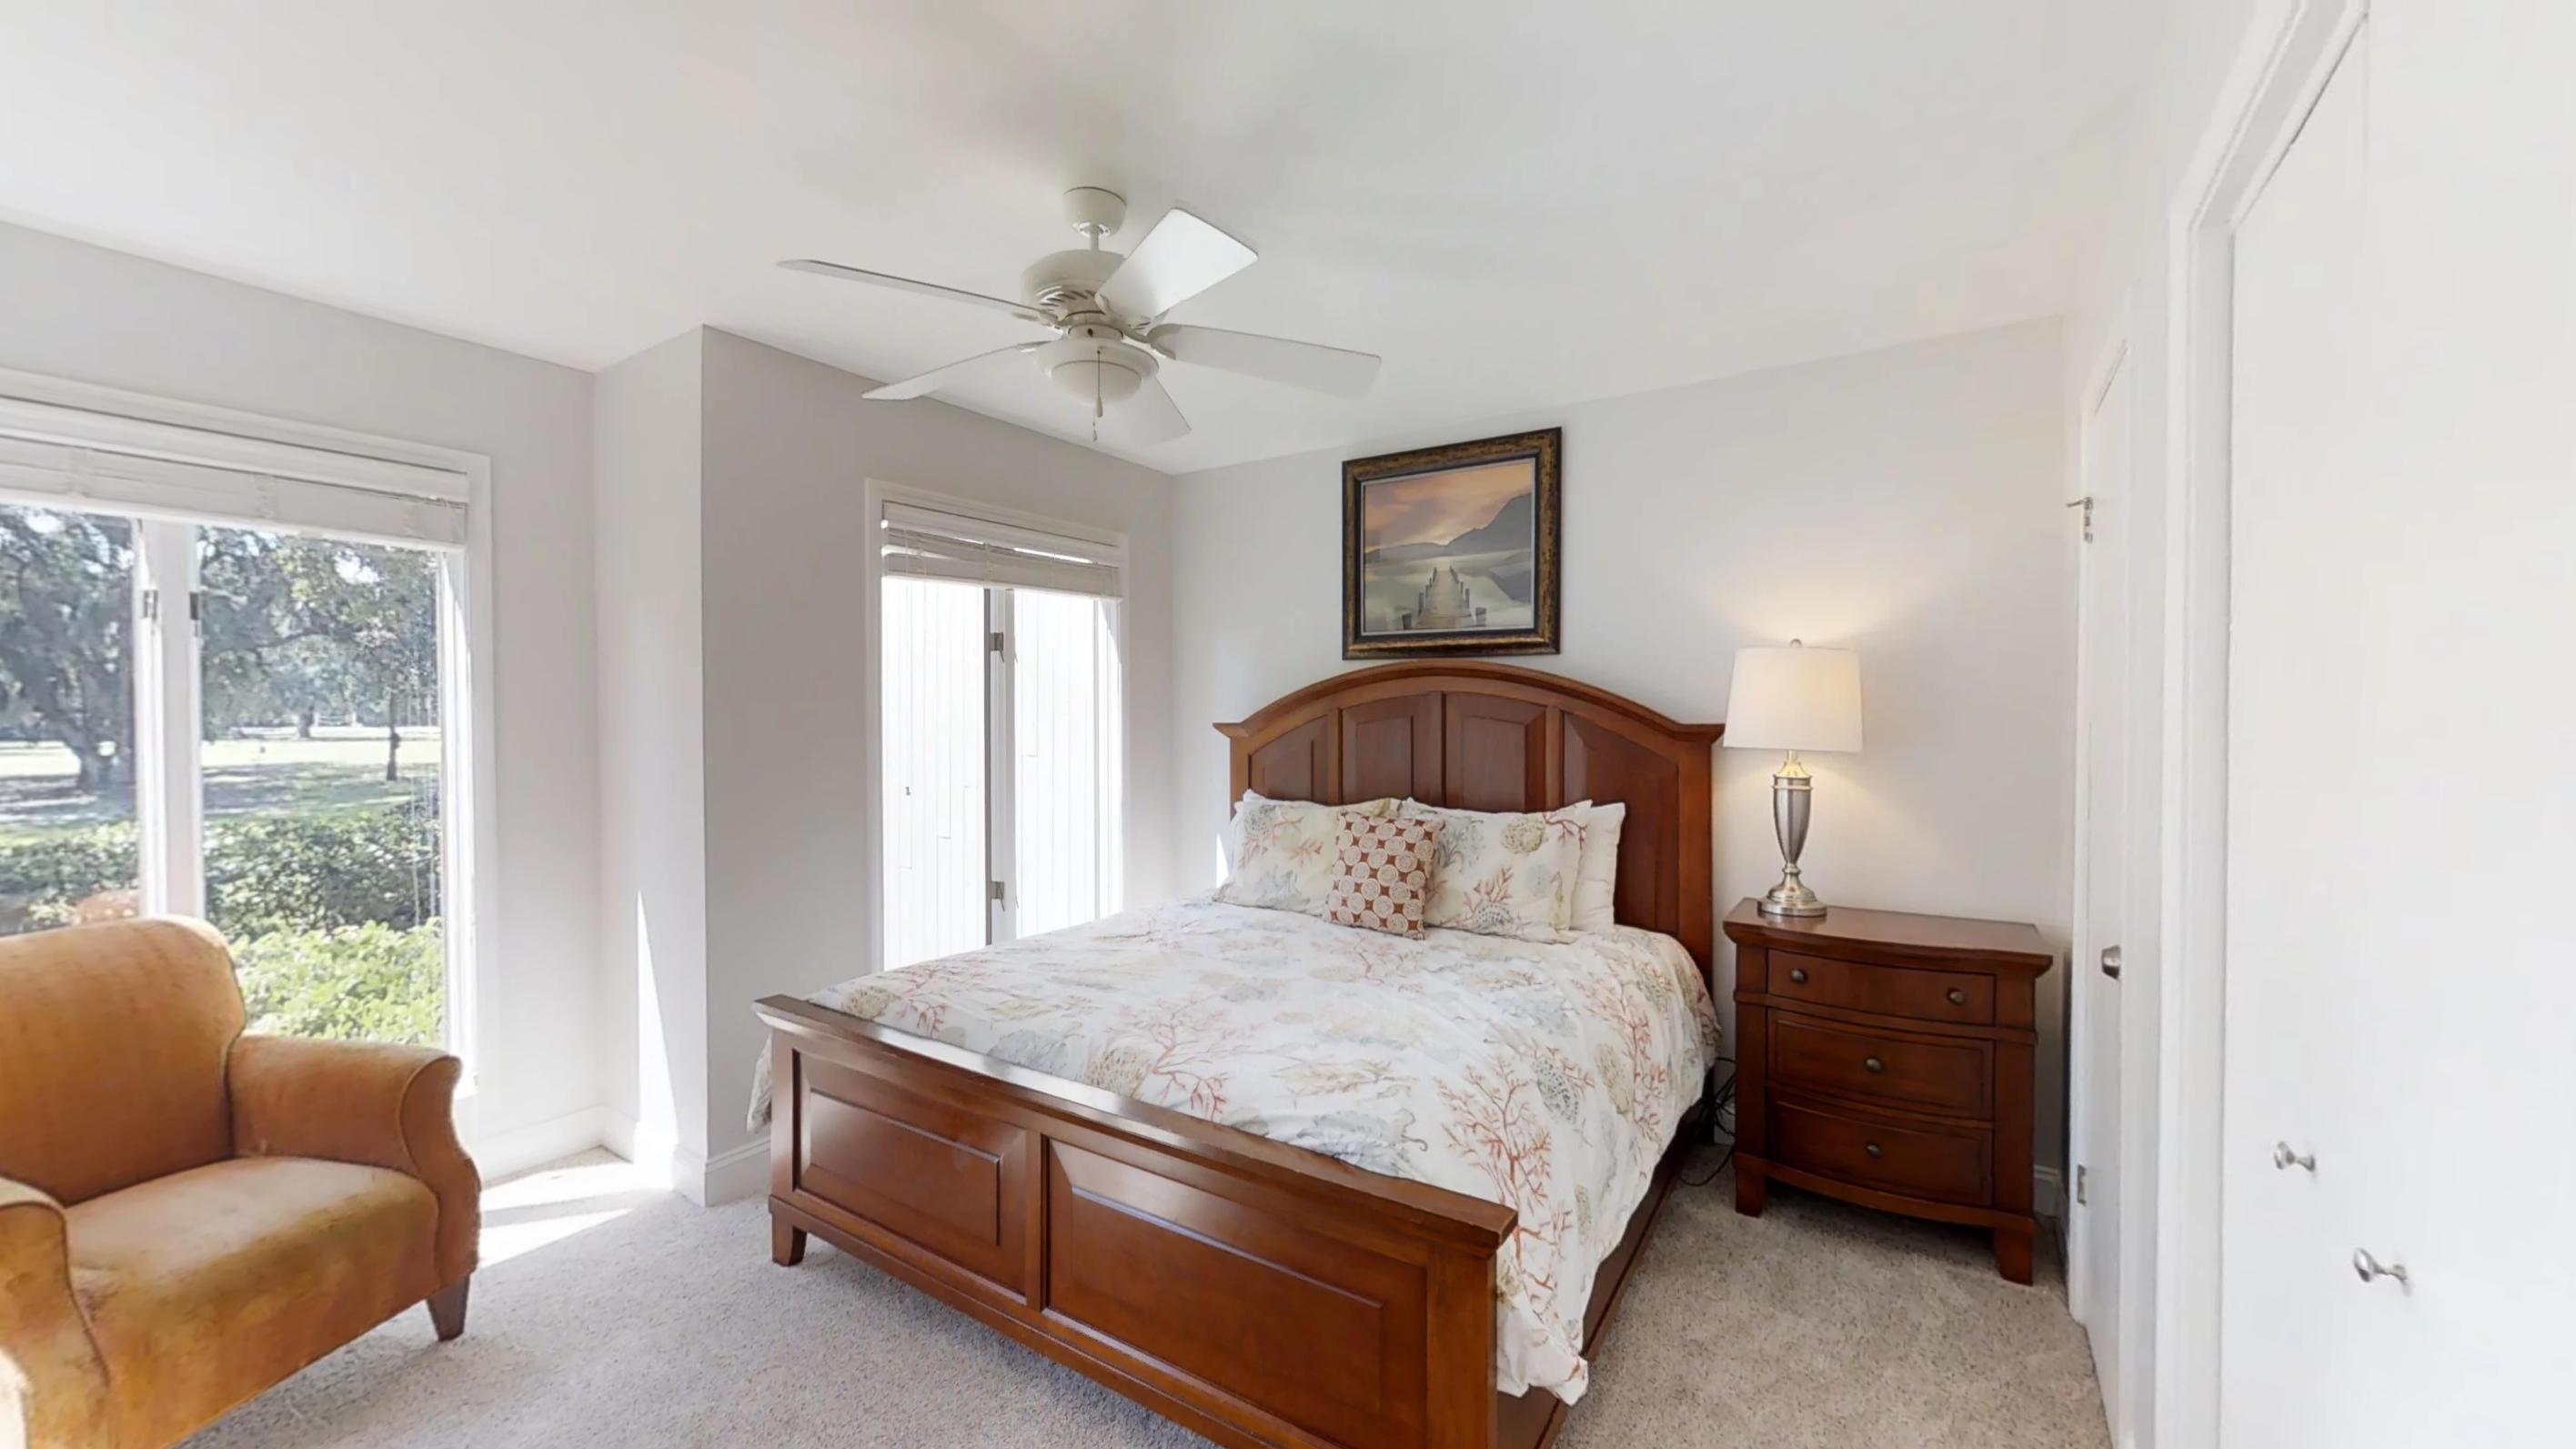 Kiawah Island Homes For Sale - 4511 Park Lake, Kiawah Island, SC - 15